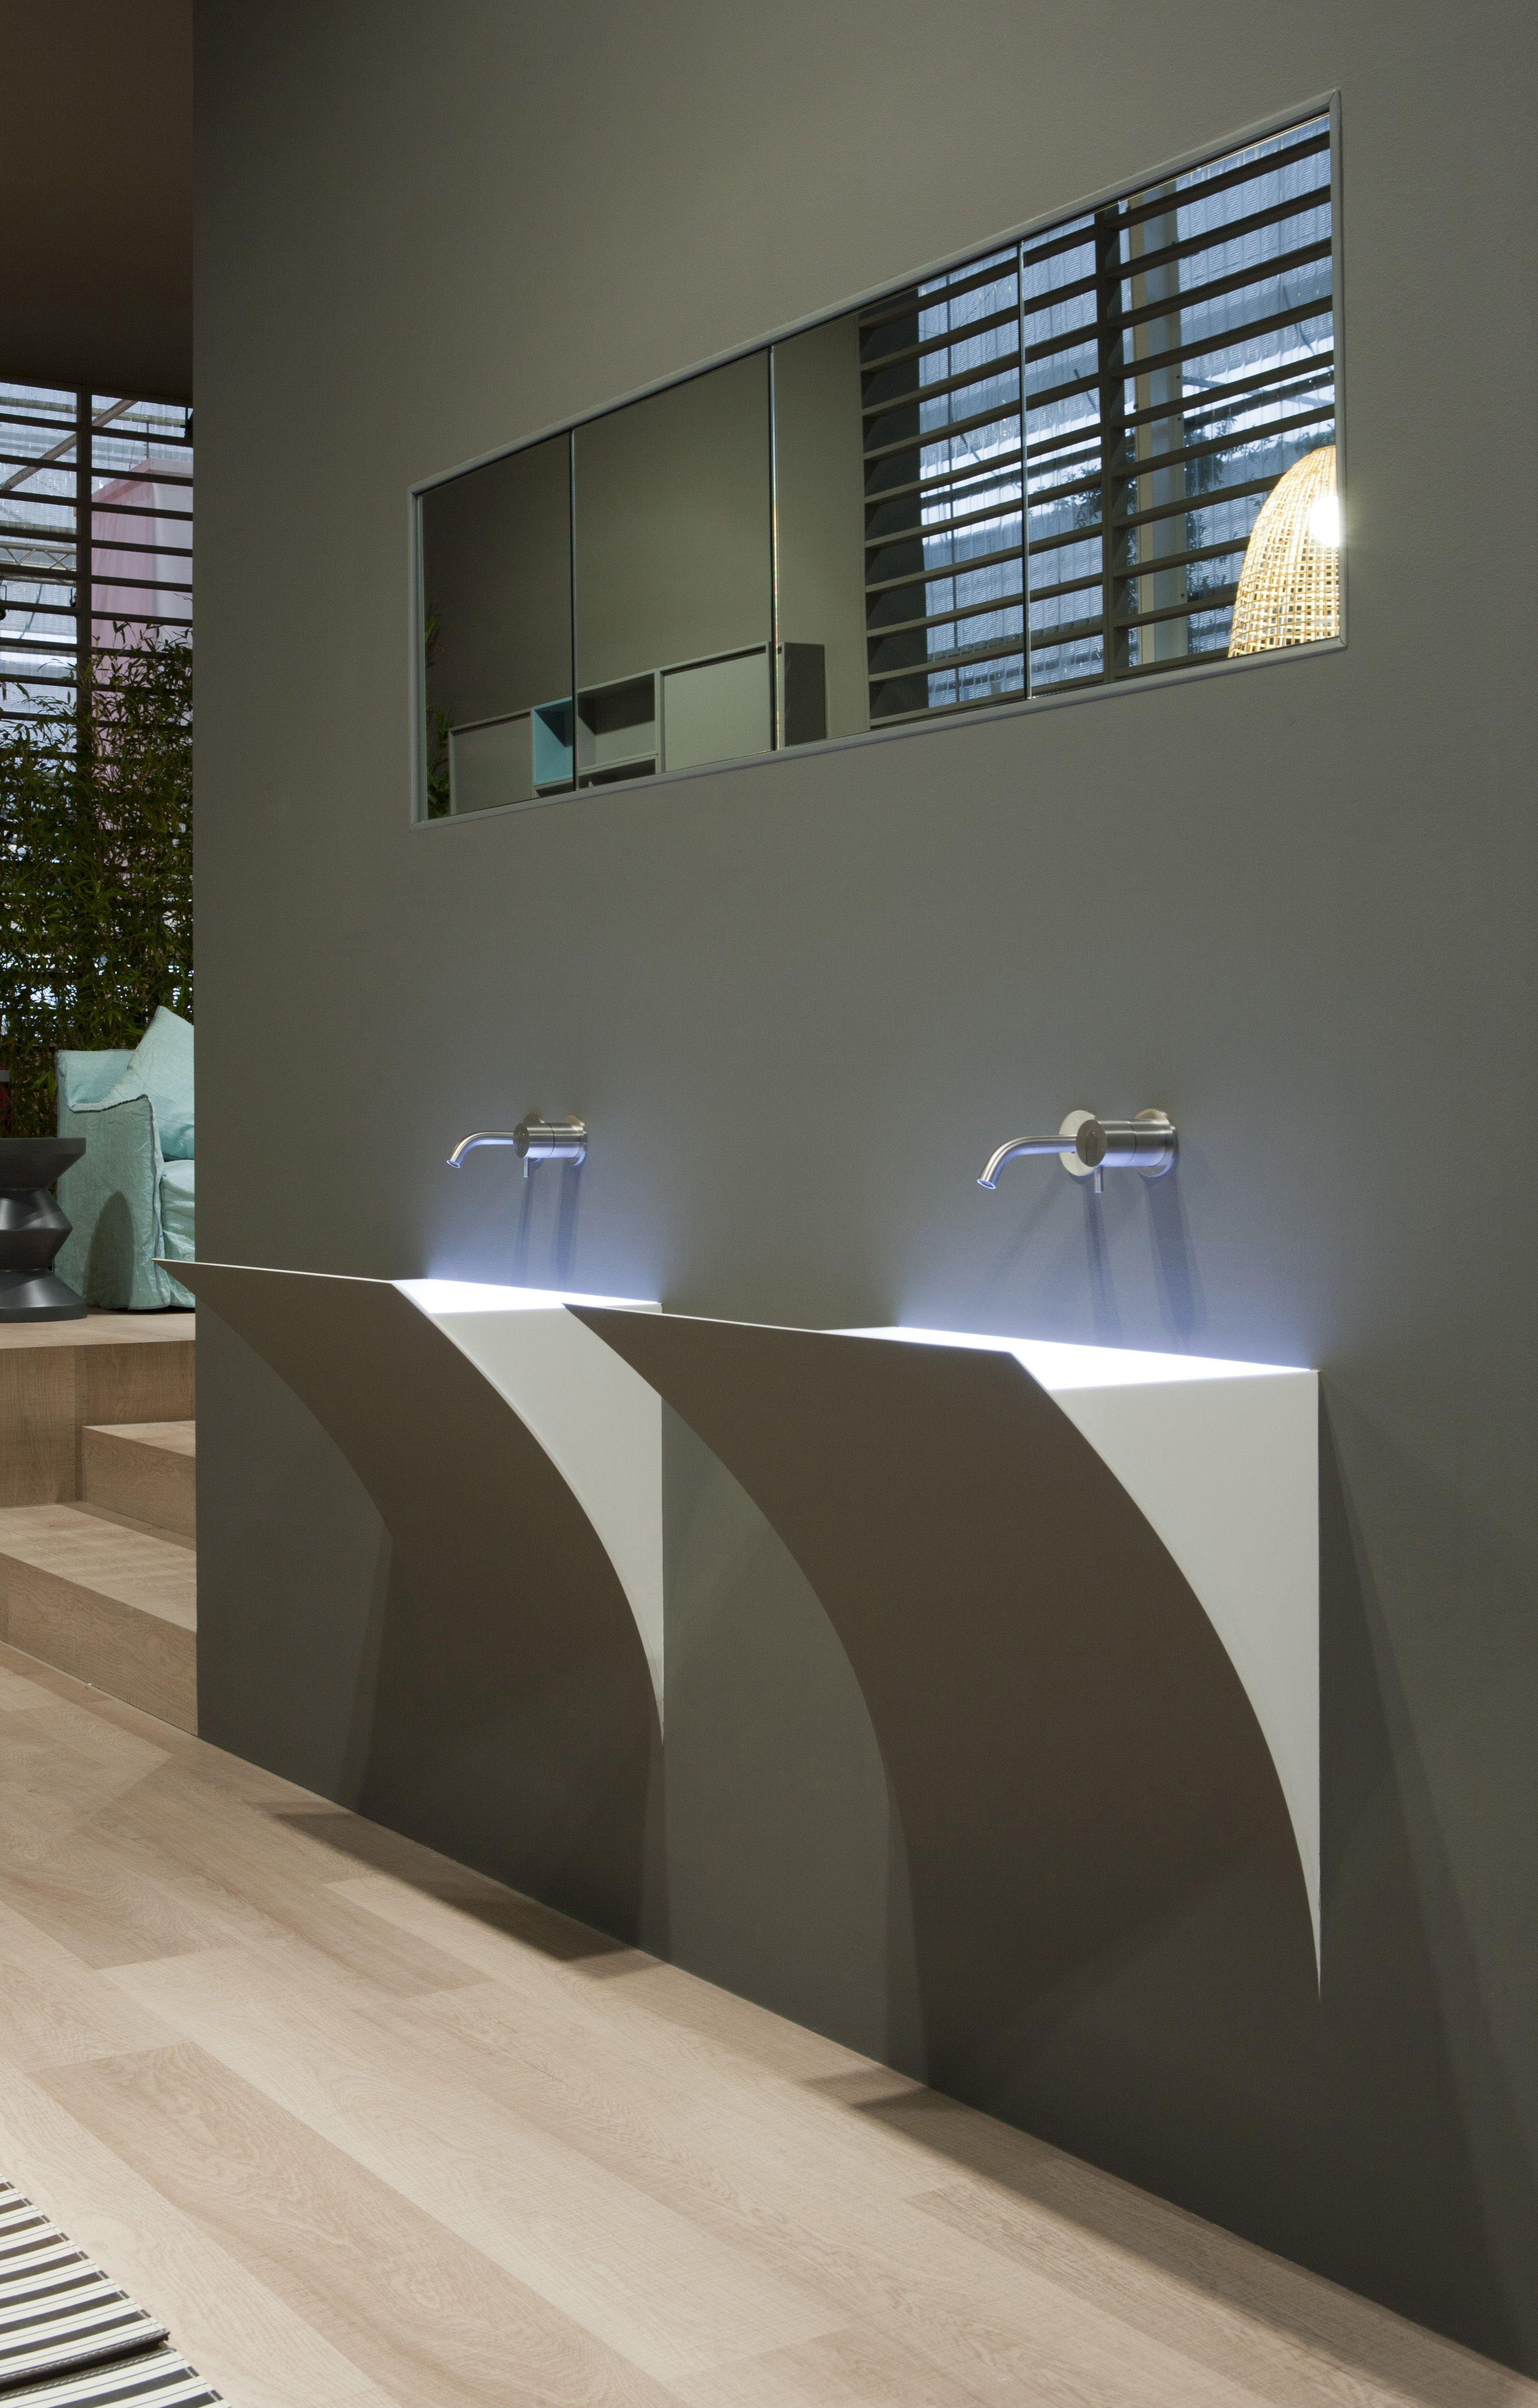 70 Creative Bathroom Sinks Mpania Neroxytes Spitia